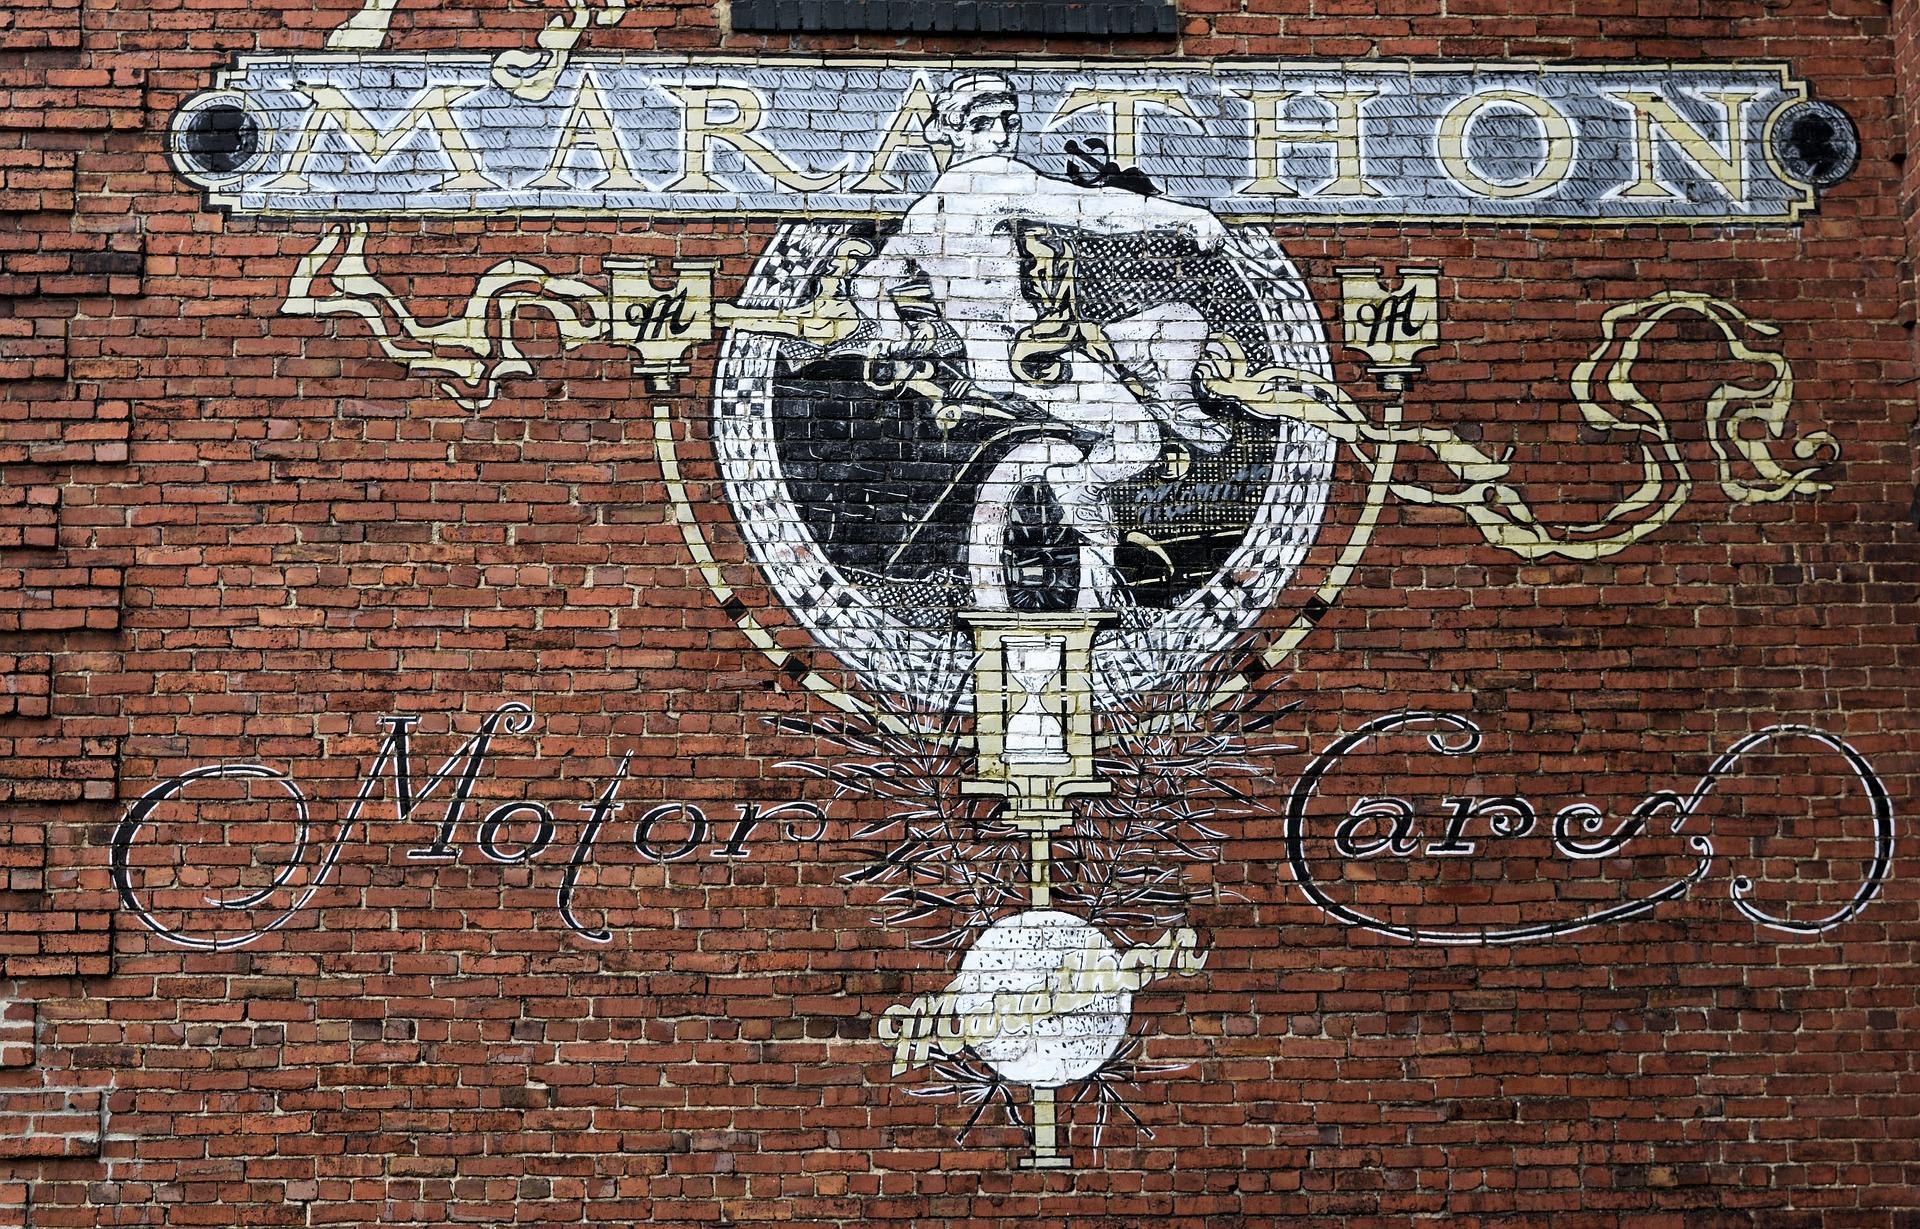 wall-mural-2290170_1920.jpg